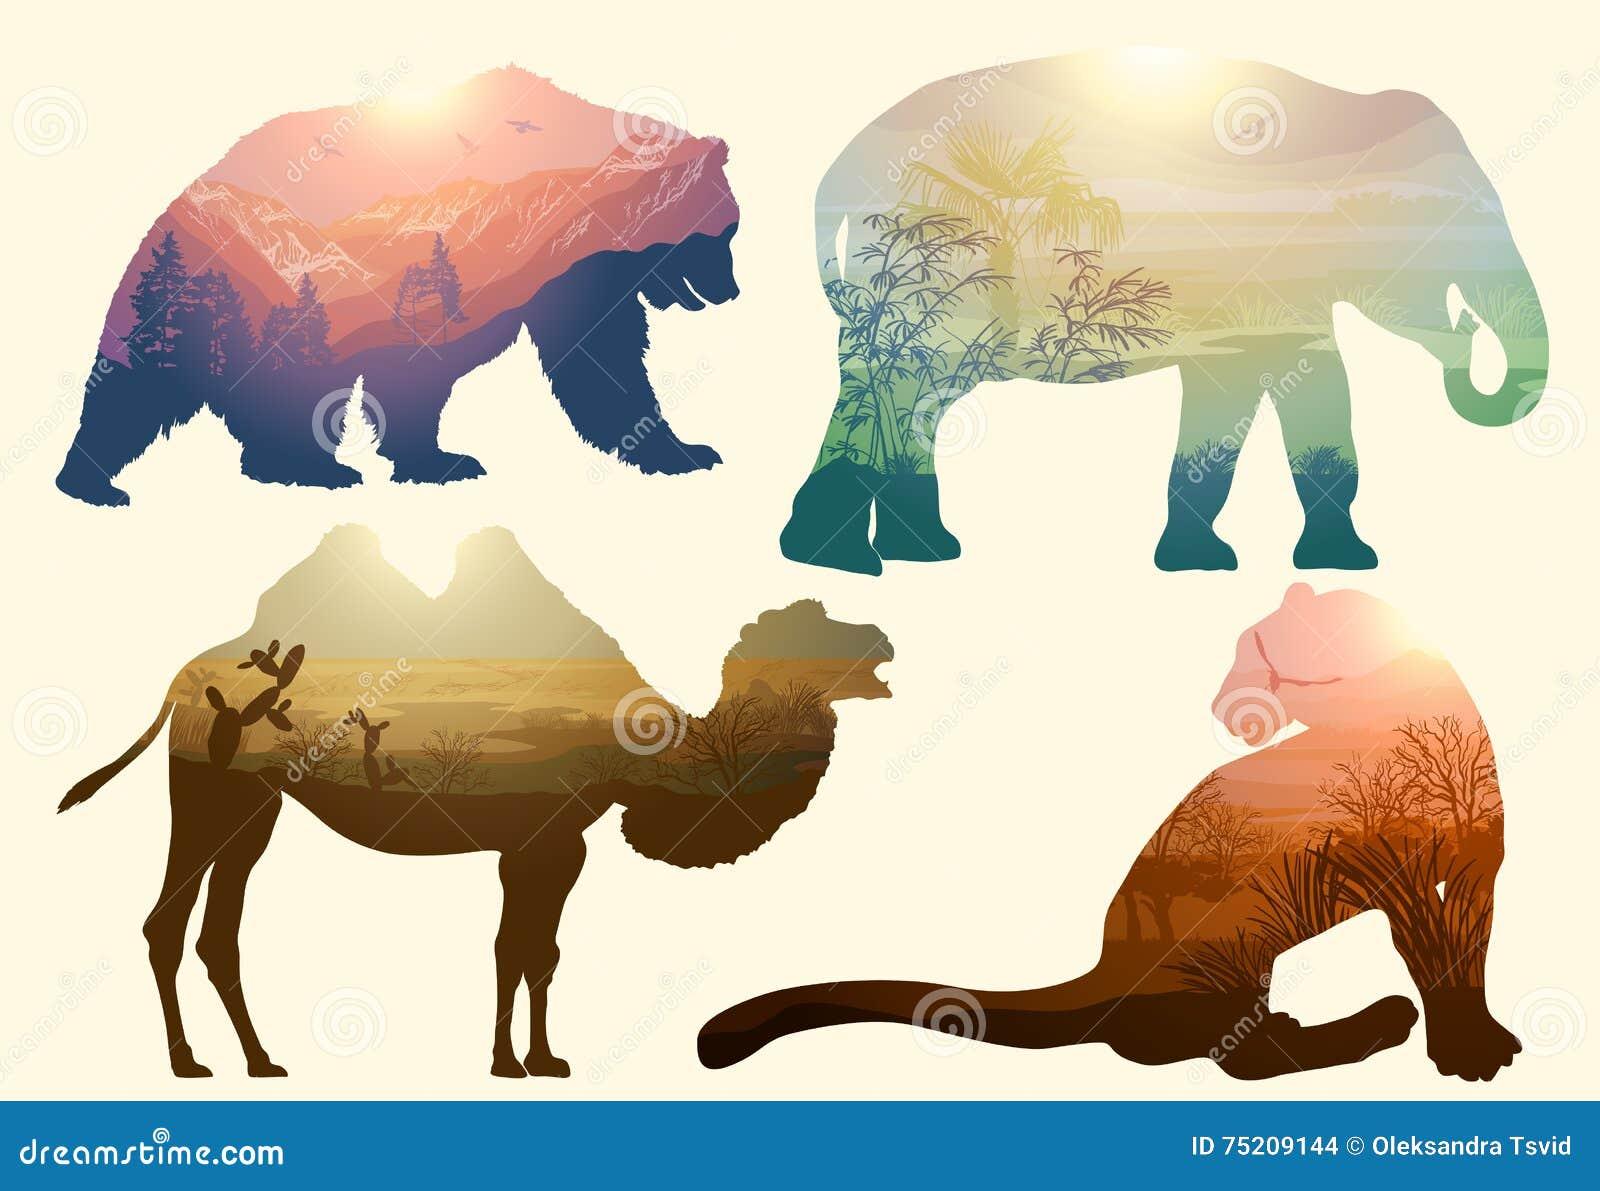 Oso, elefante, camello y leopardo, fauna